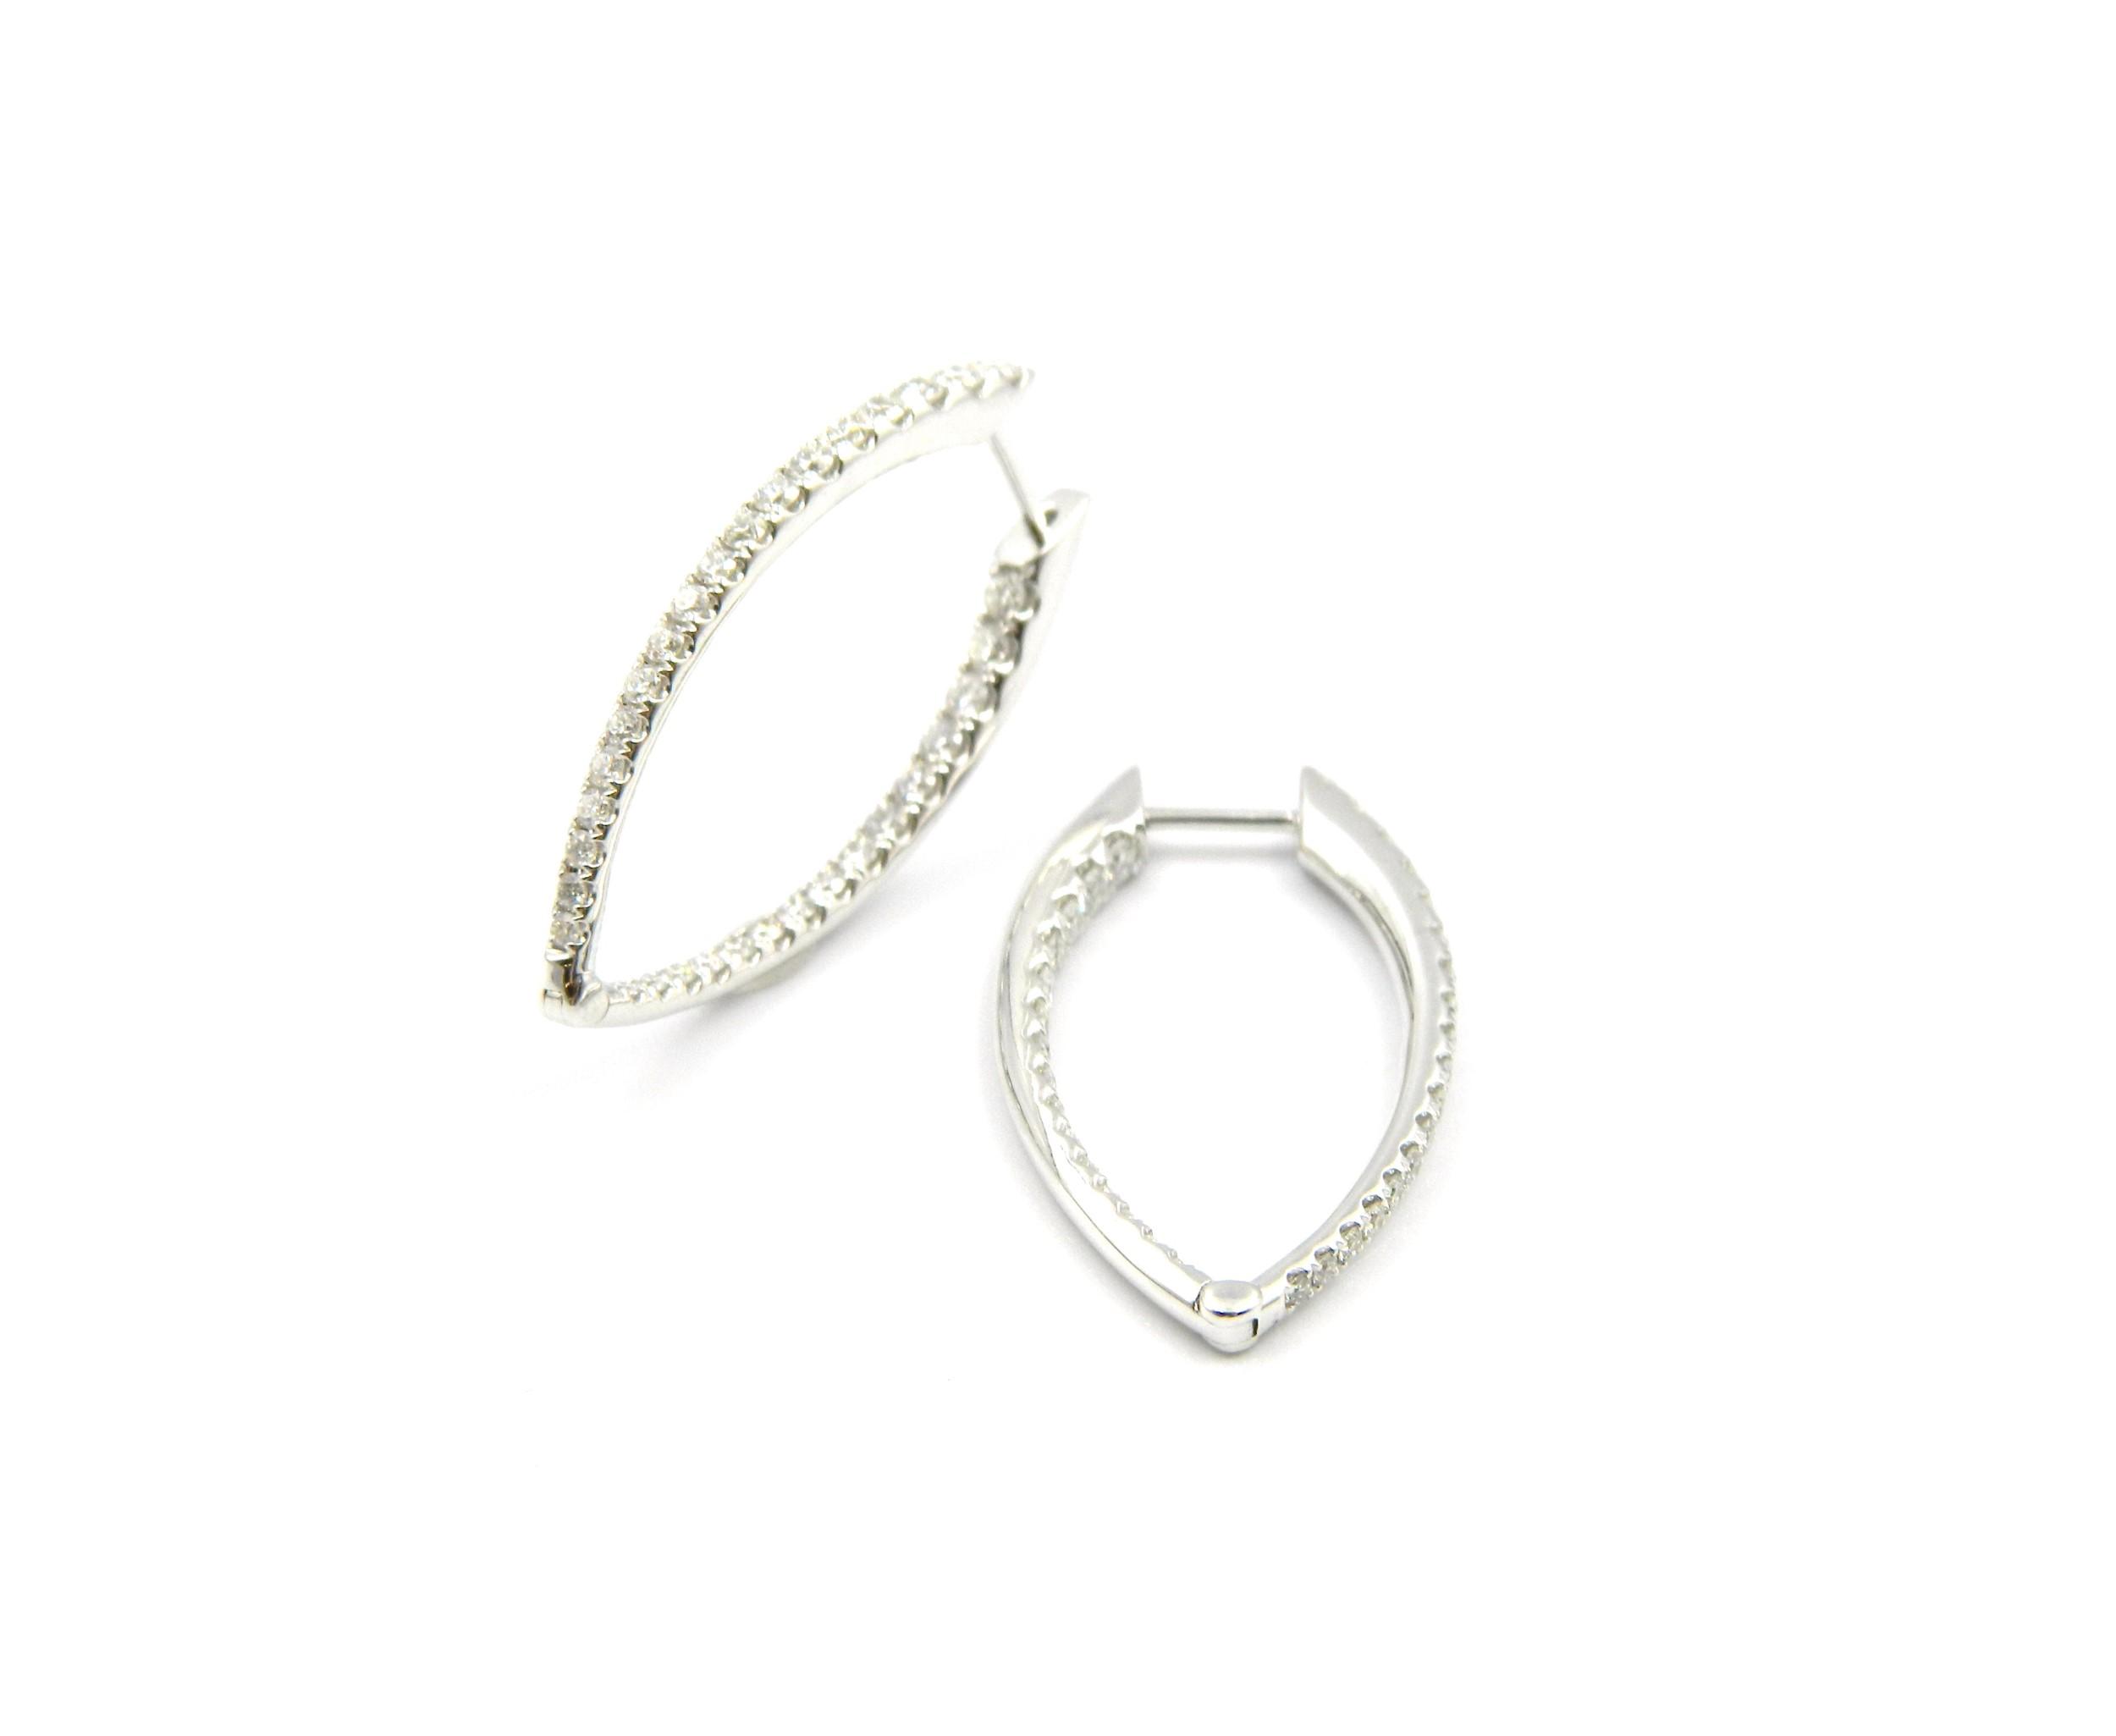 White Gold Elongated Diamond Hoops